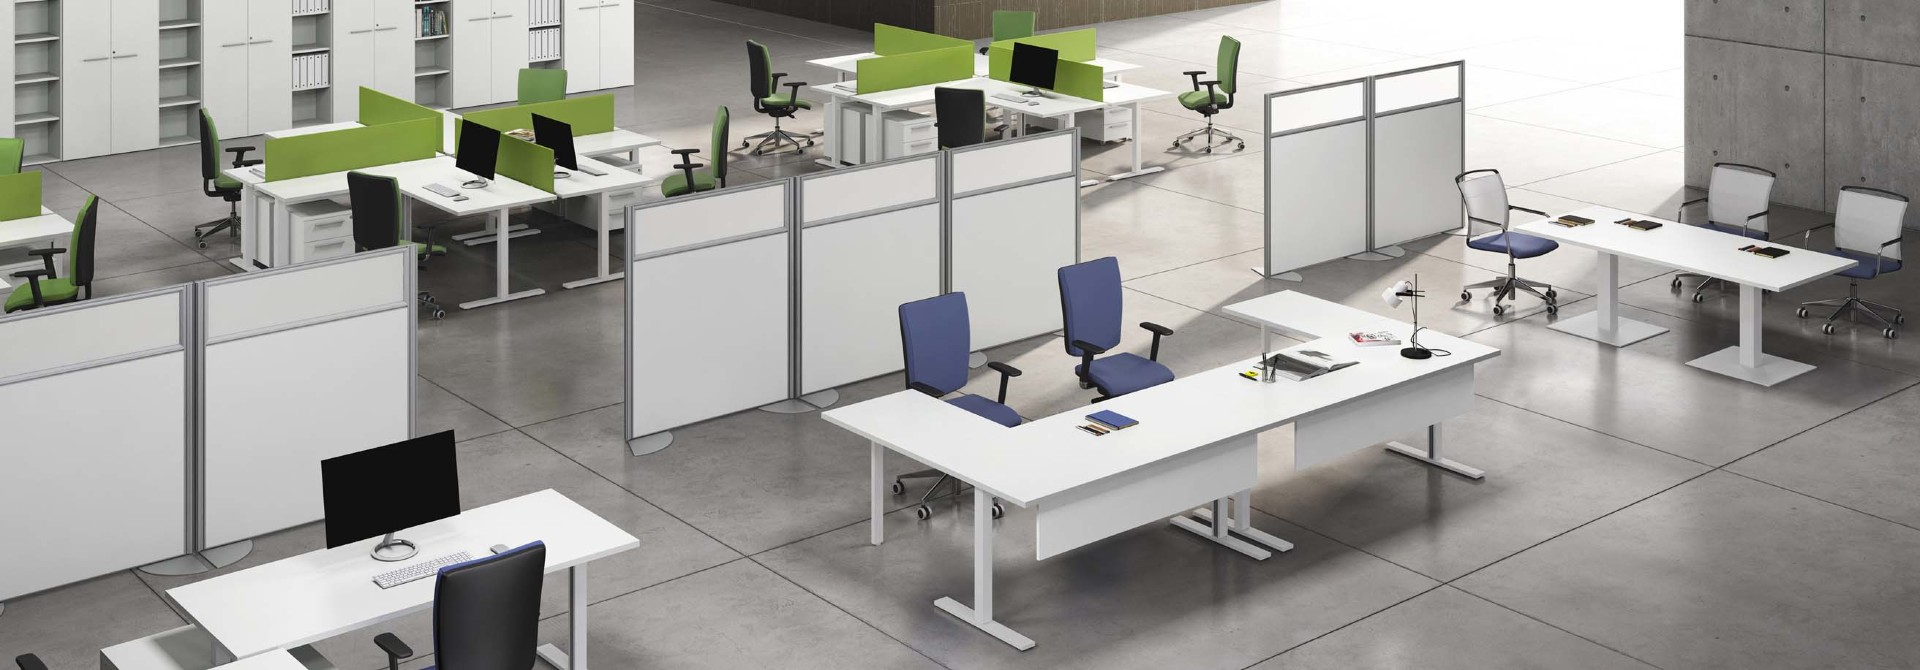 g1-operative-call-center-free-standing.jpg